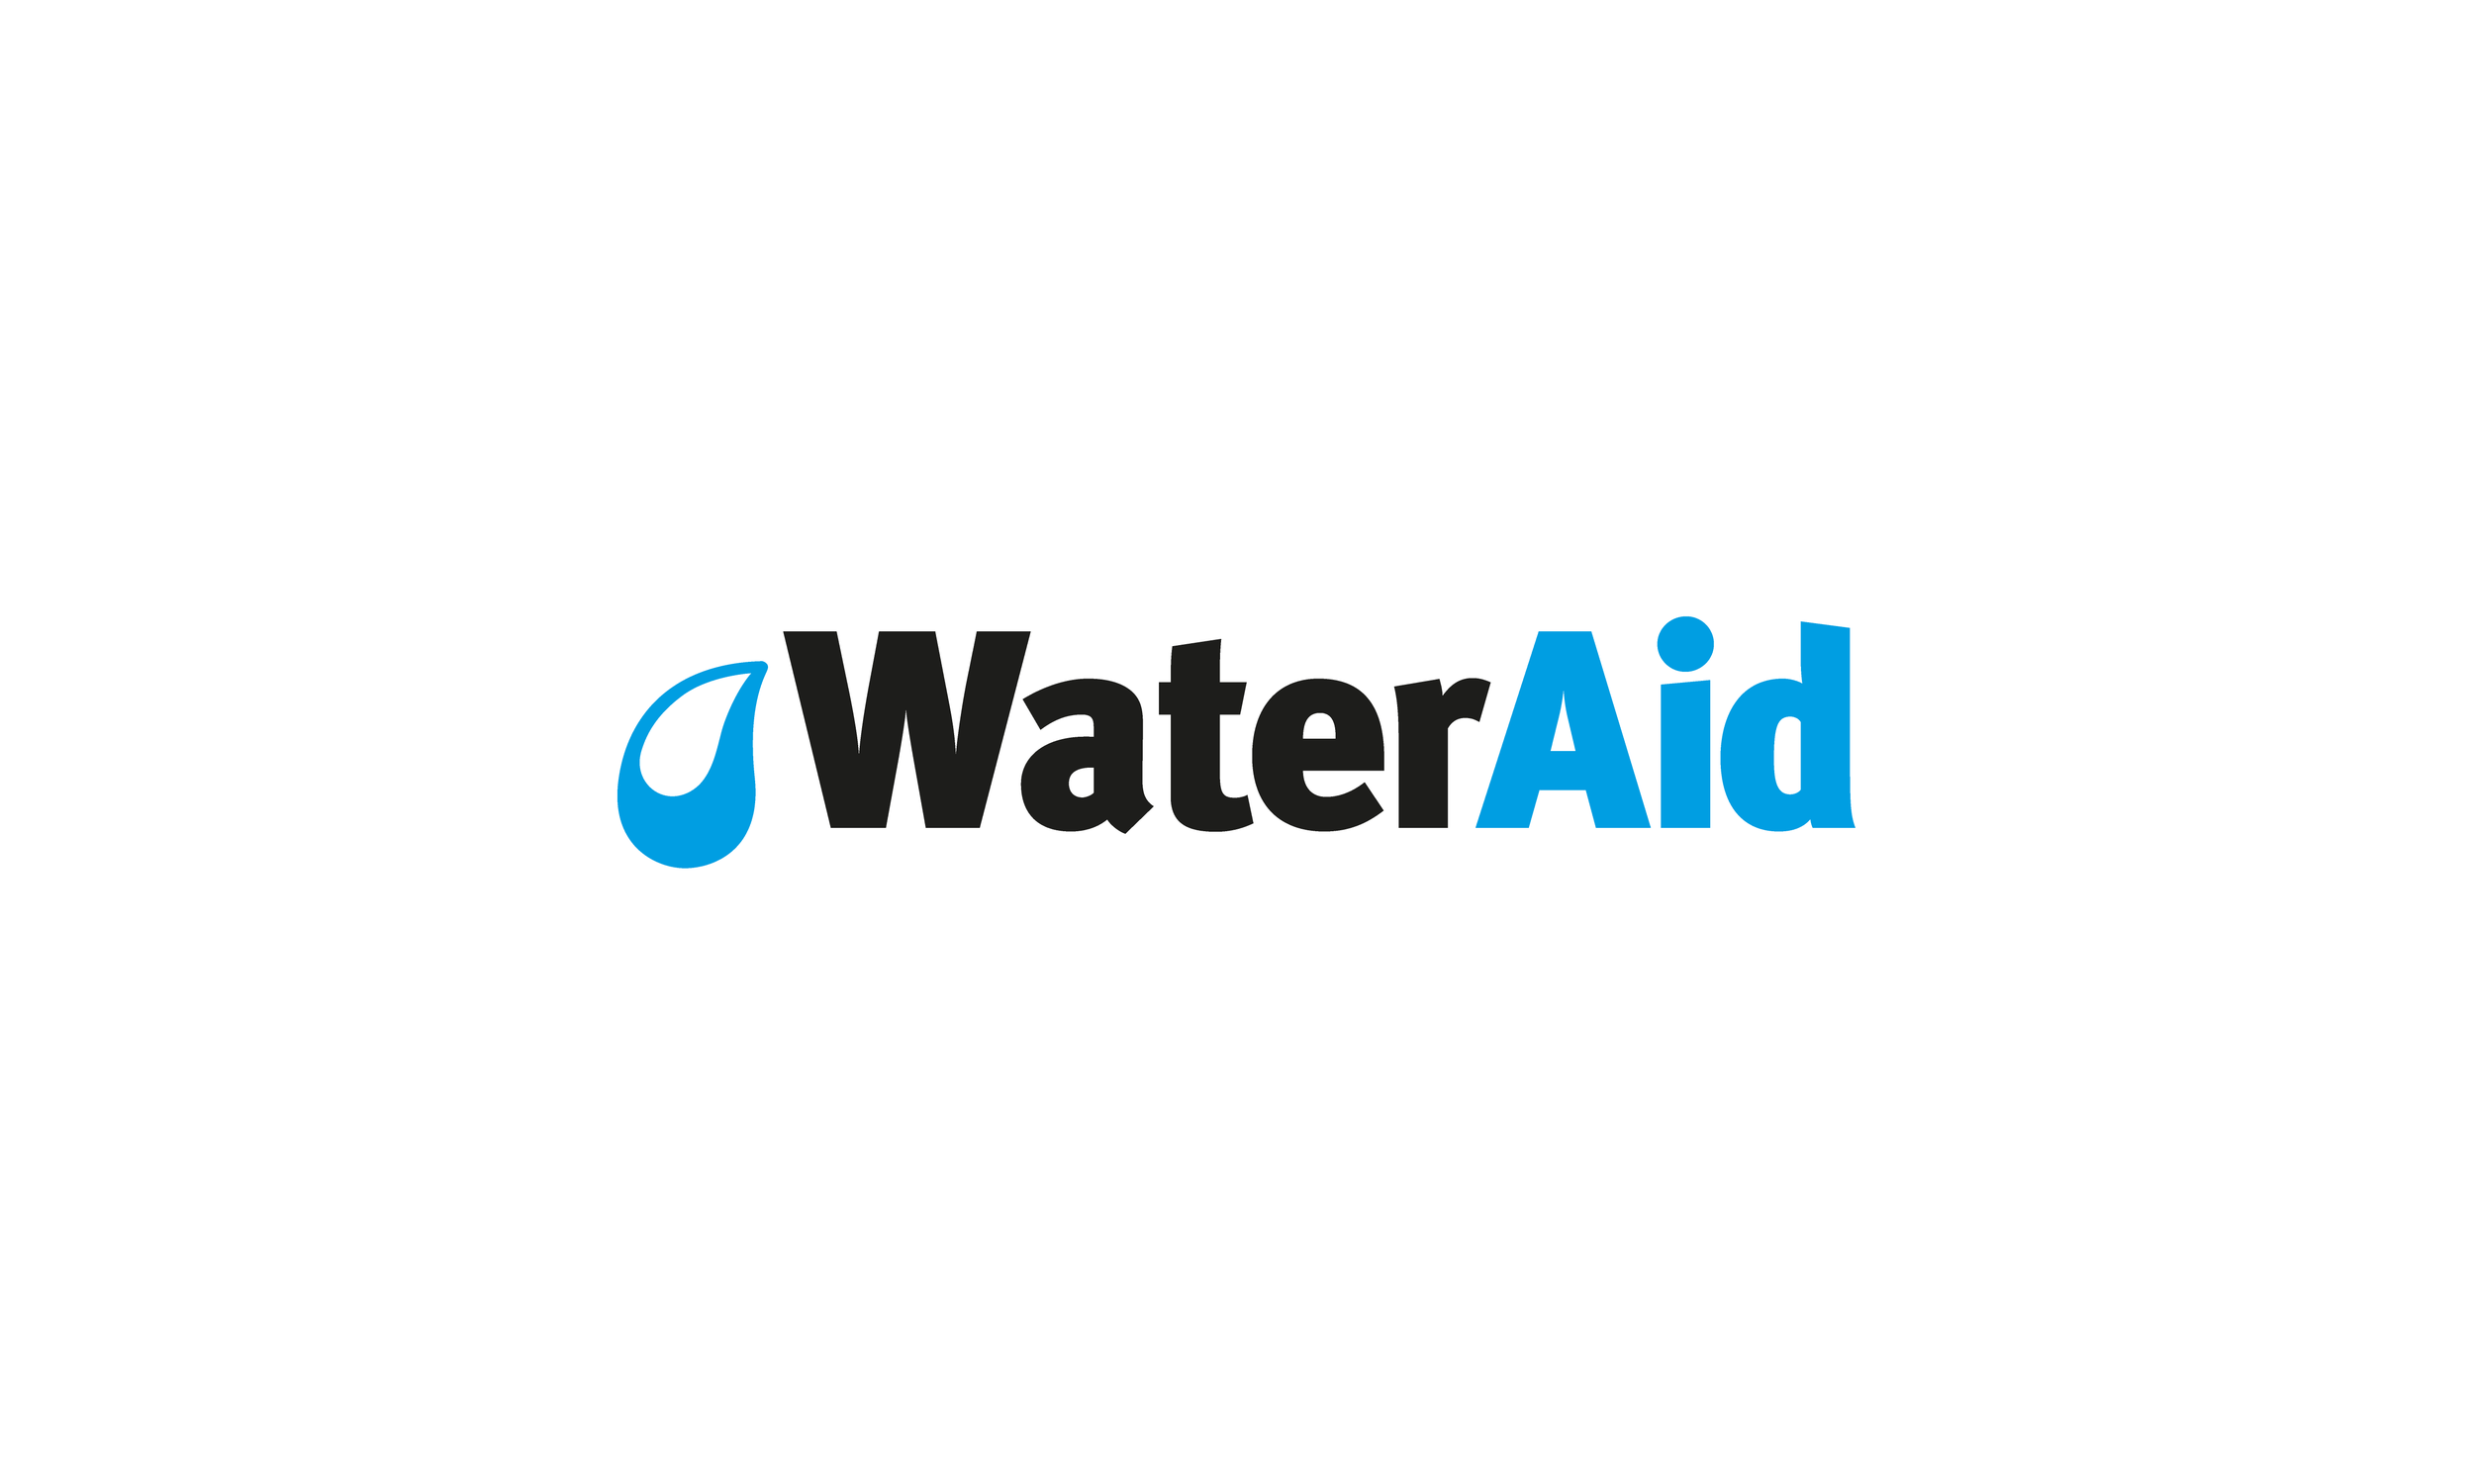 WATERAID WEB ELEMENTS-01.png